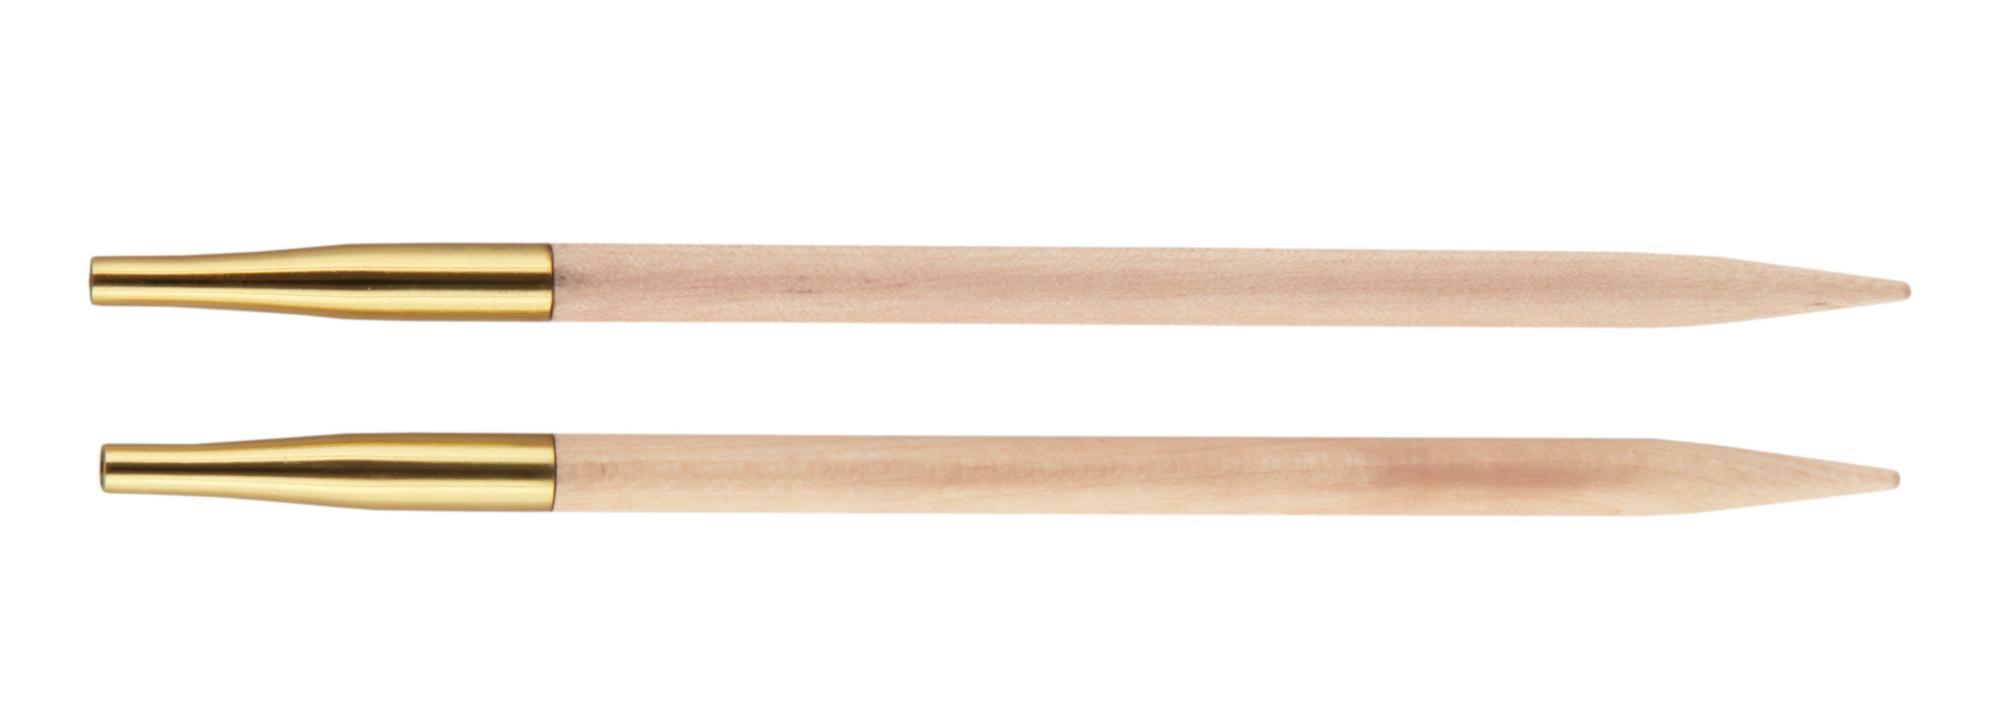 Спицы съемные Basix Birch Wood KnitPro, 35633, 3.50 мм